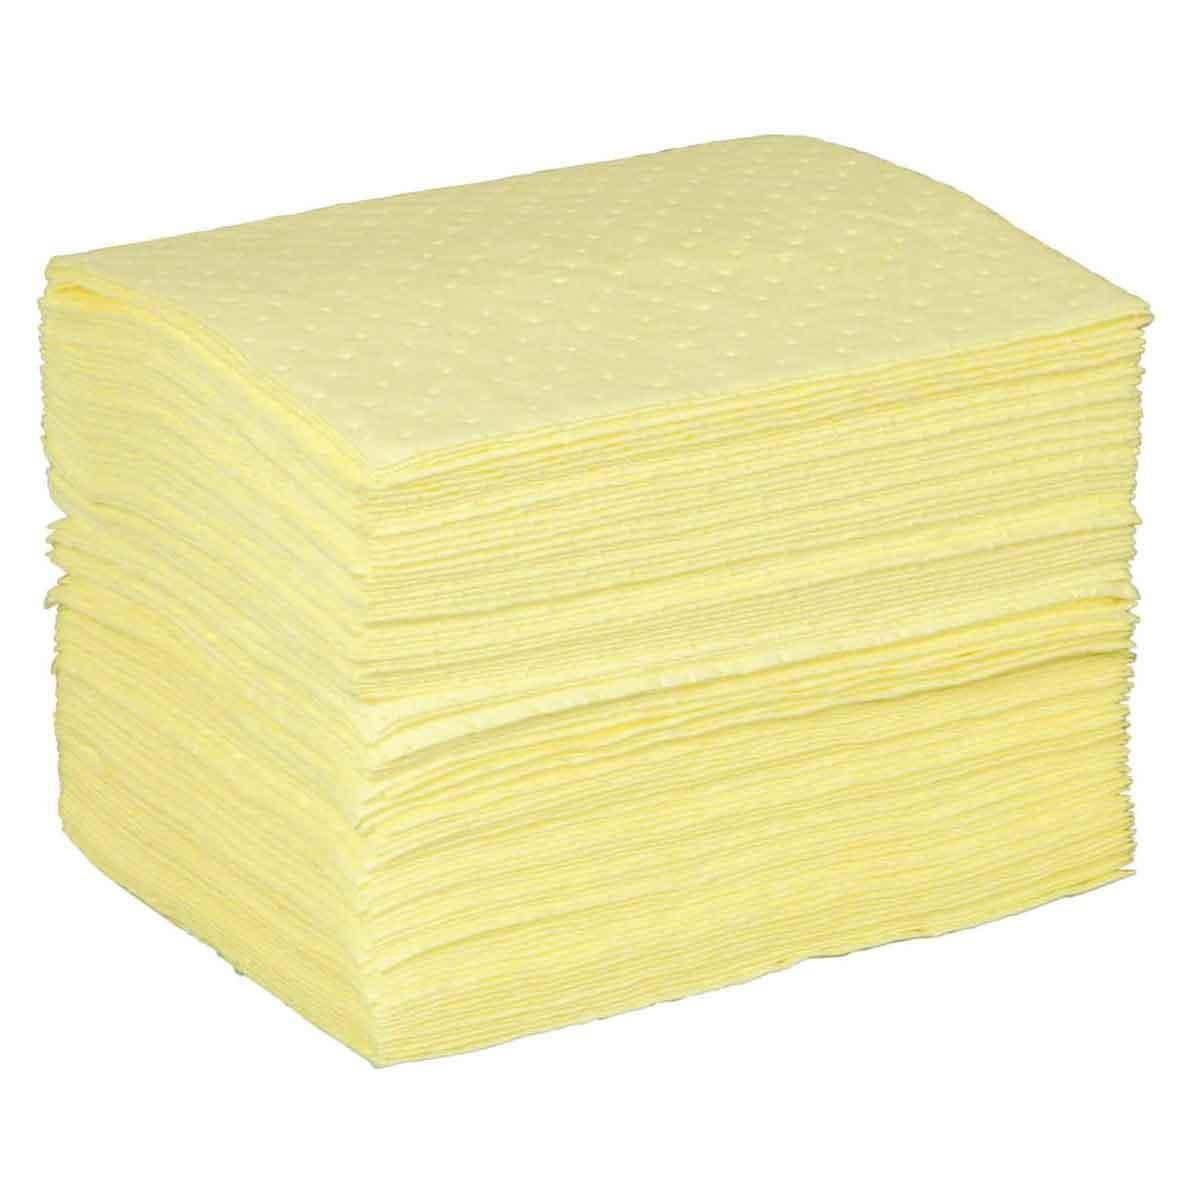 SPC® AllWik® AW99 Industrial Spill Specialties Absorbent Pillow, 9 in L x 9 in W, 15.4 gal Absorption, Polypropylene